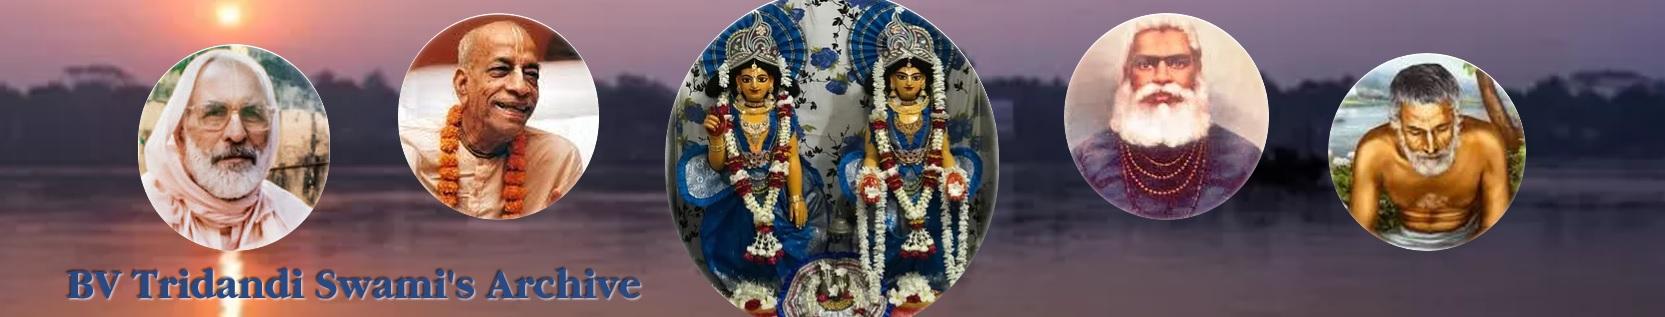 Sripad Bhaktivedanta Tridandi Swami header image